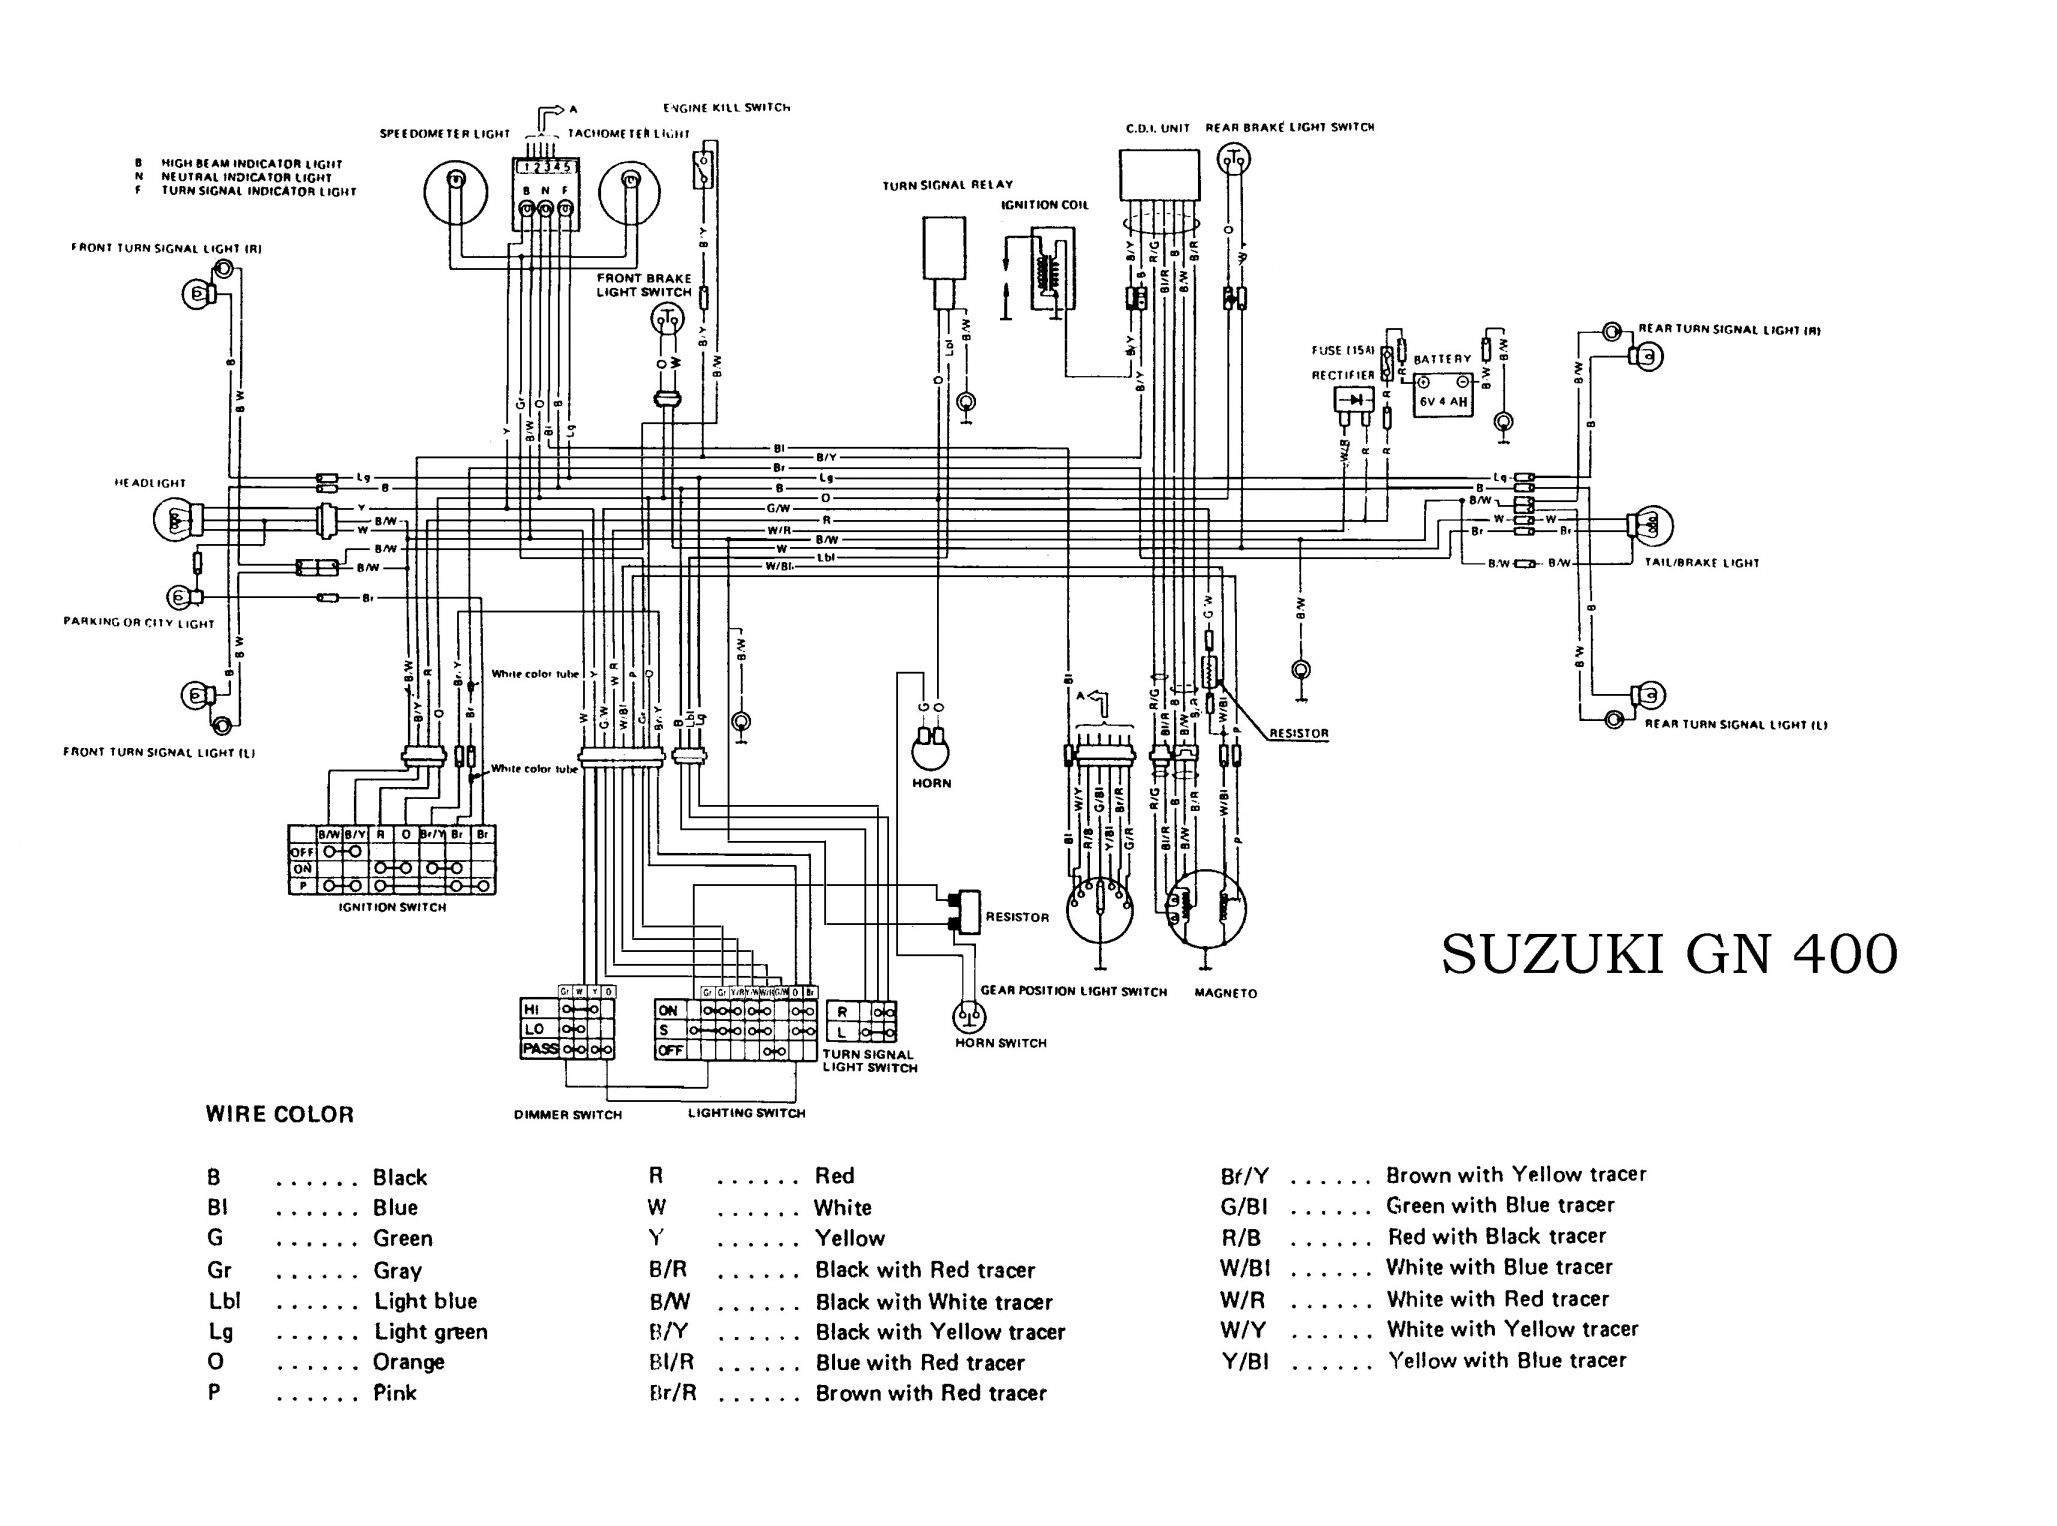 18 Toyota 4age Engine Wiring Diagram Engine Diagram Wiringg Net Diagram Toyota Engineering